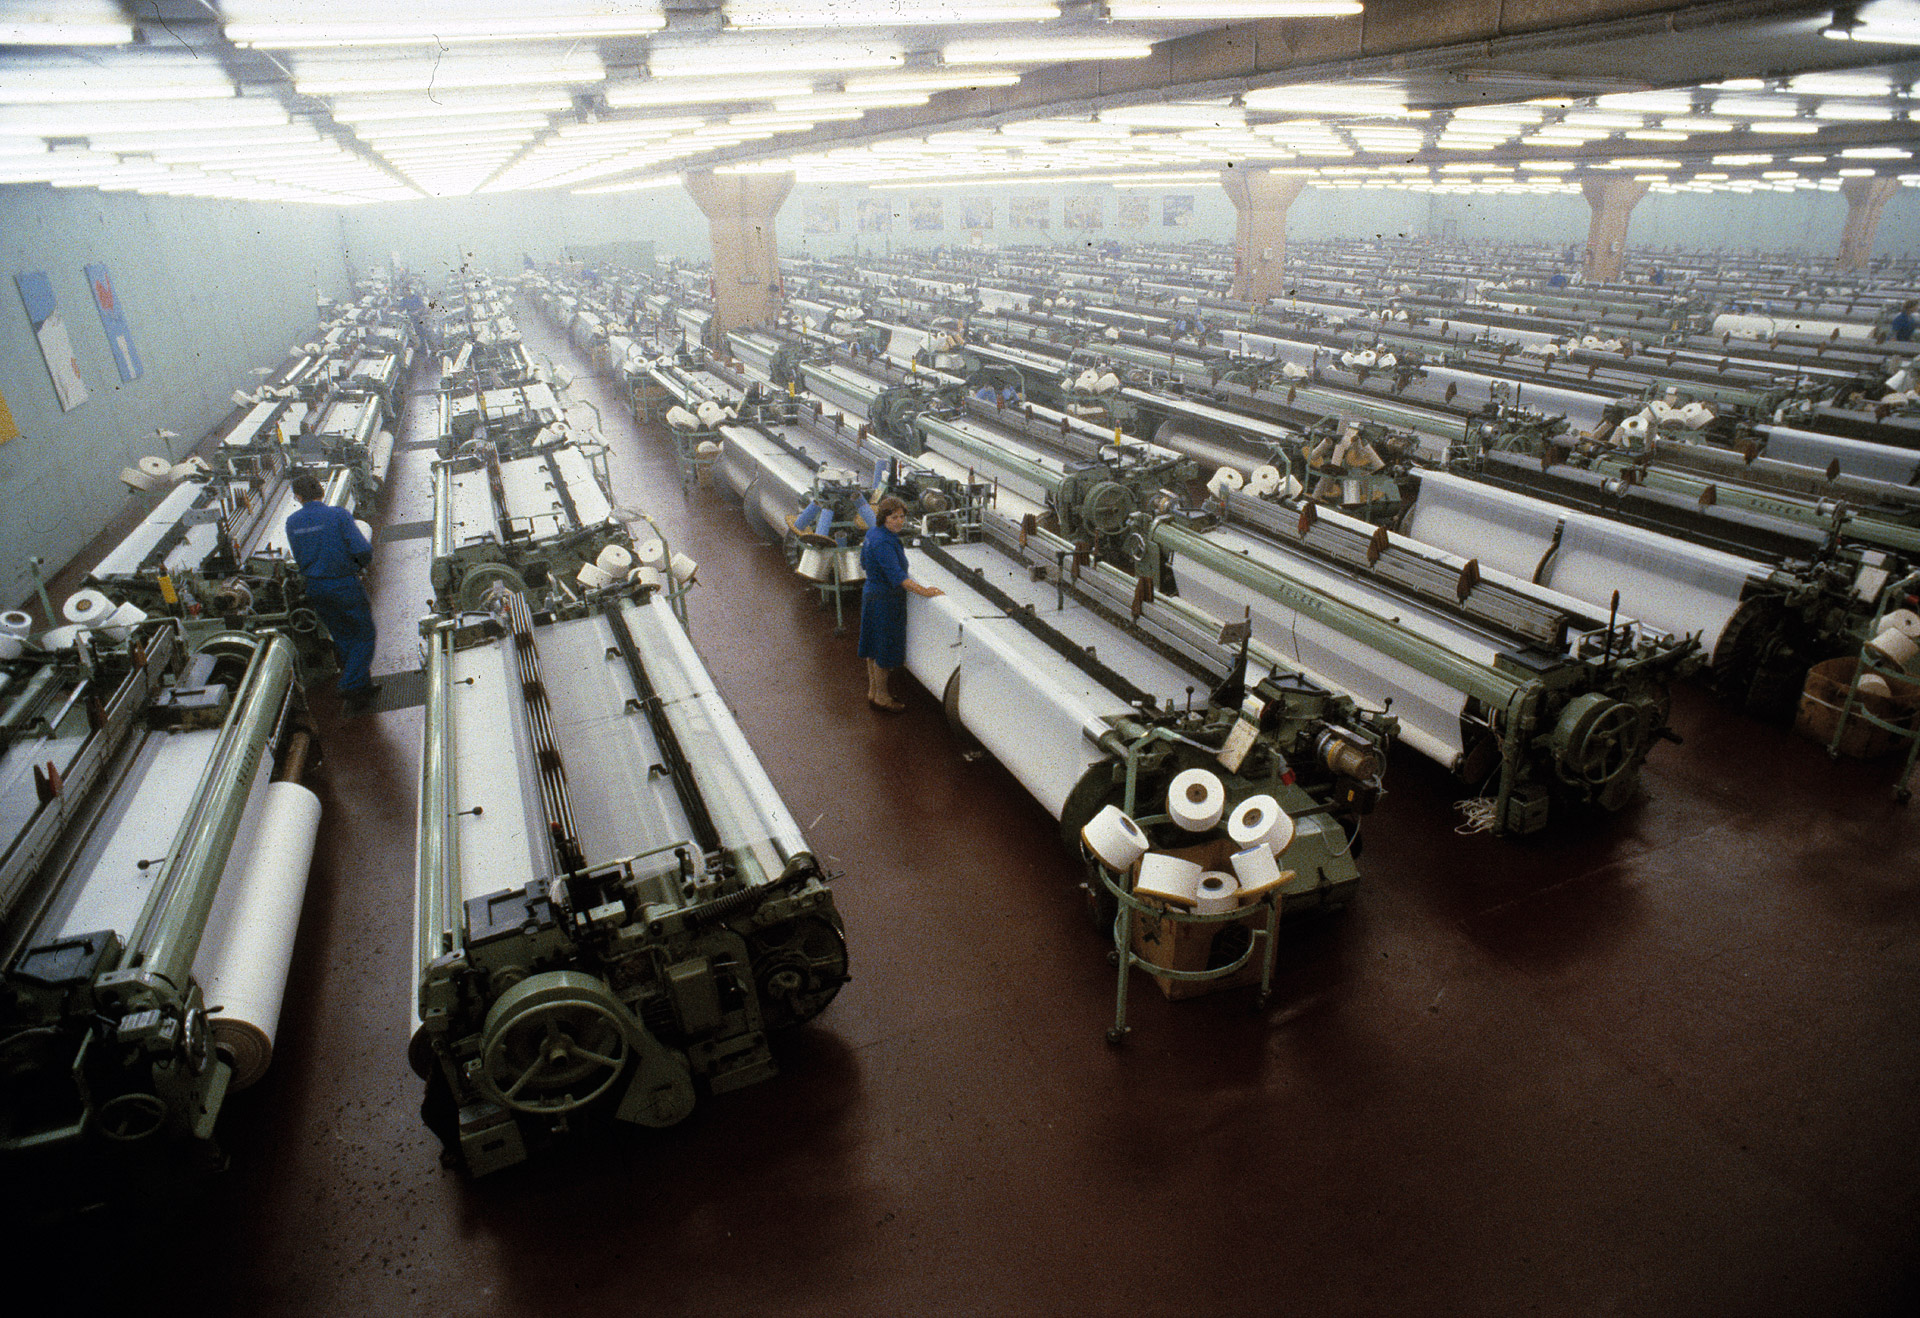 B.W. Wernerfelt weaving factory in Mo I Rana in Norway